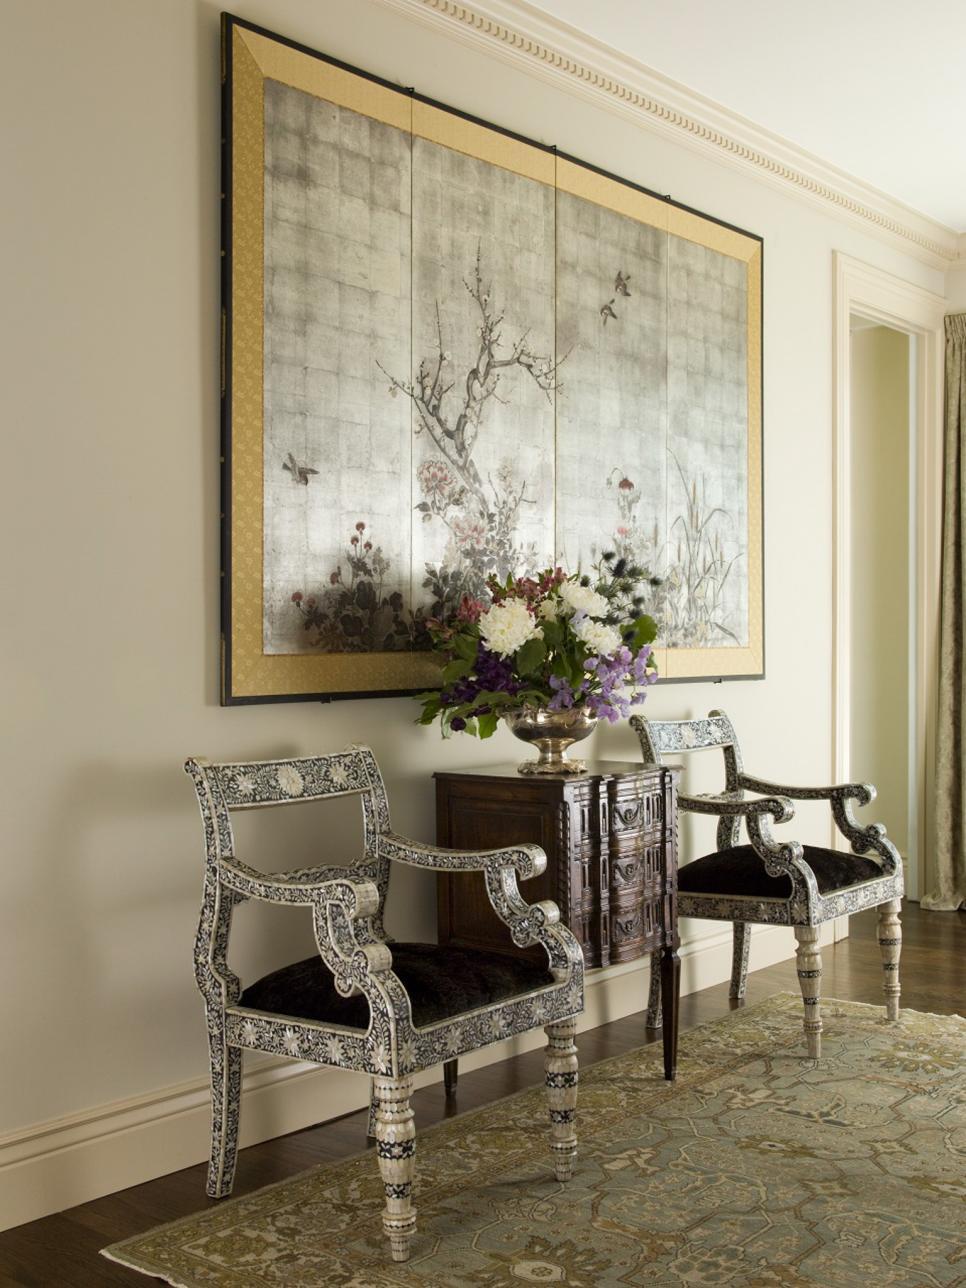 Dp maccaul turner neutral traditional hallway chairs v.jpg.rend.hgtvcom.966.1288